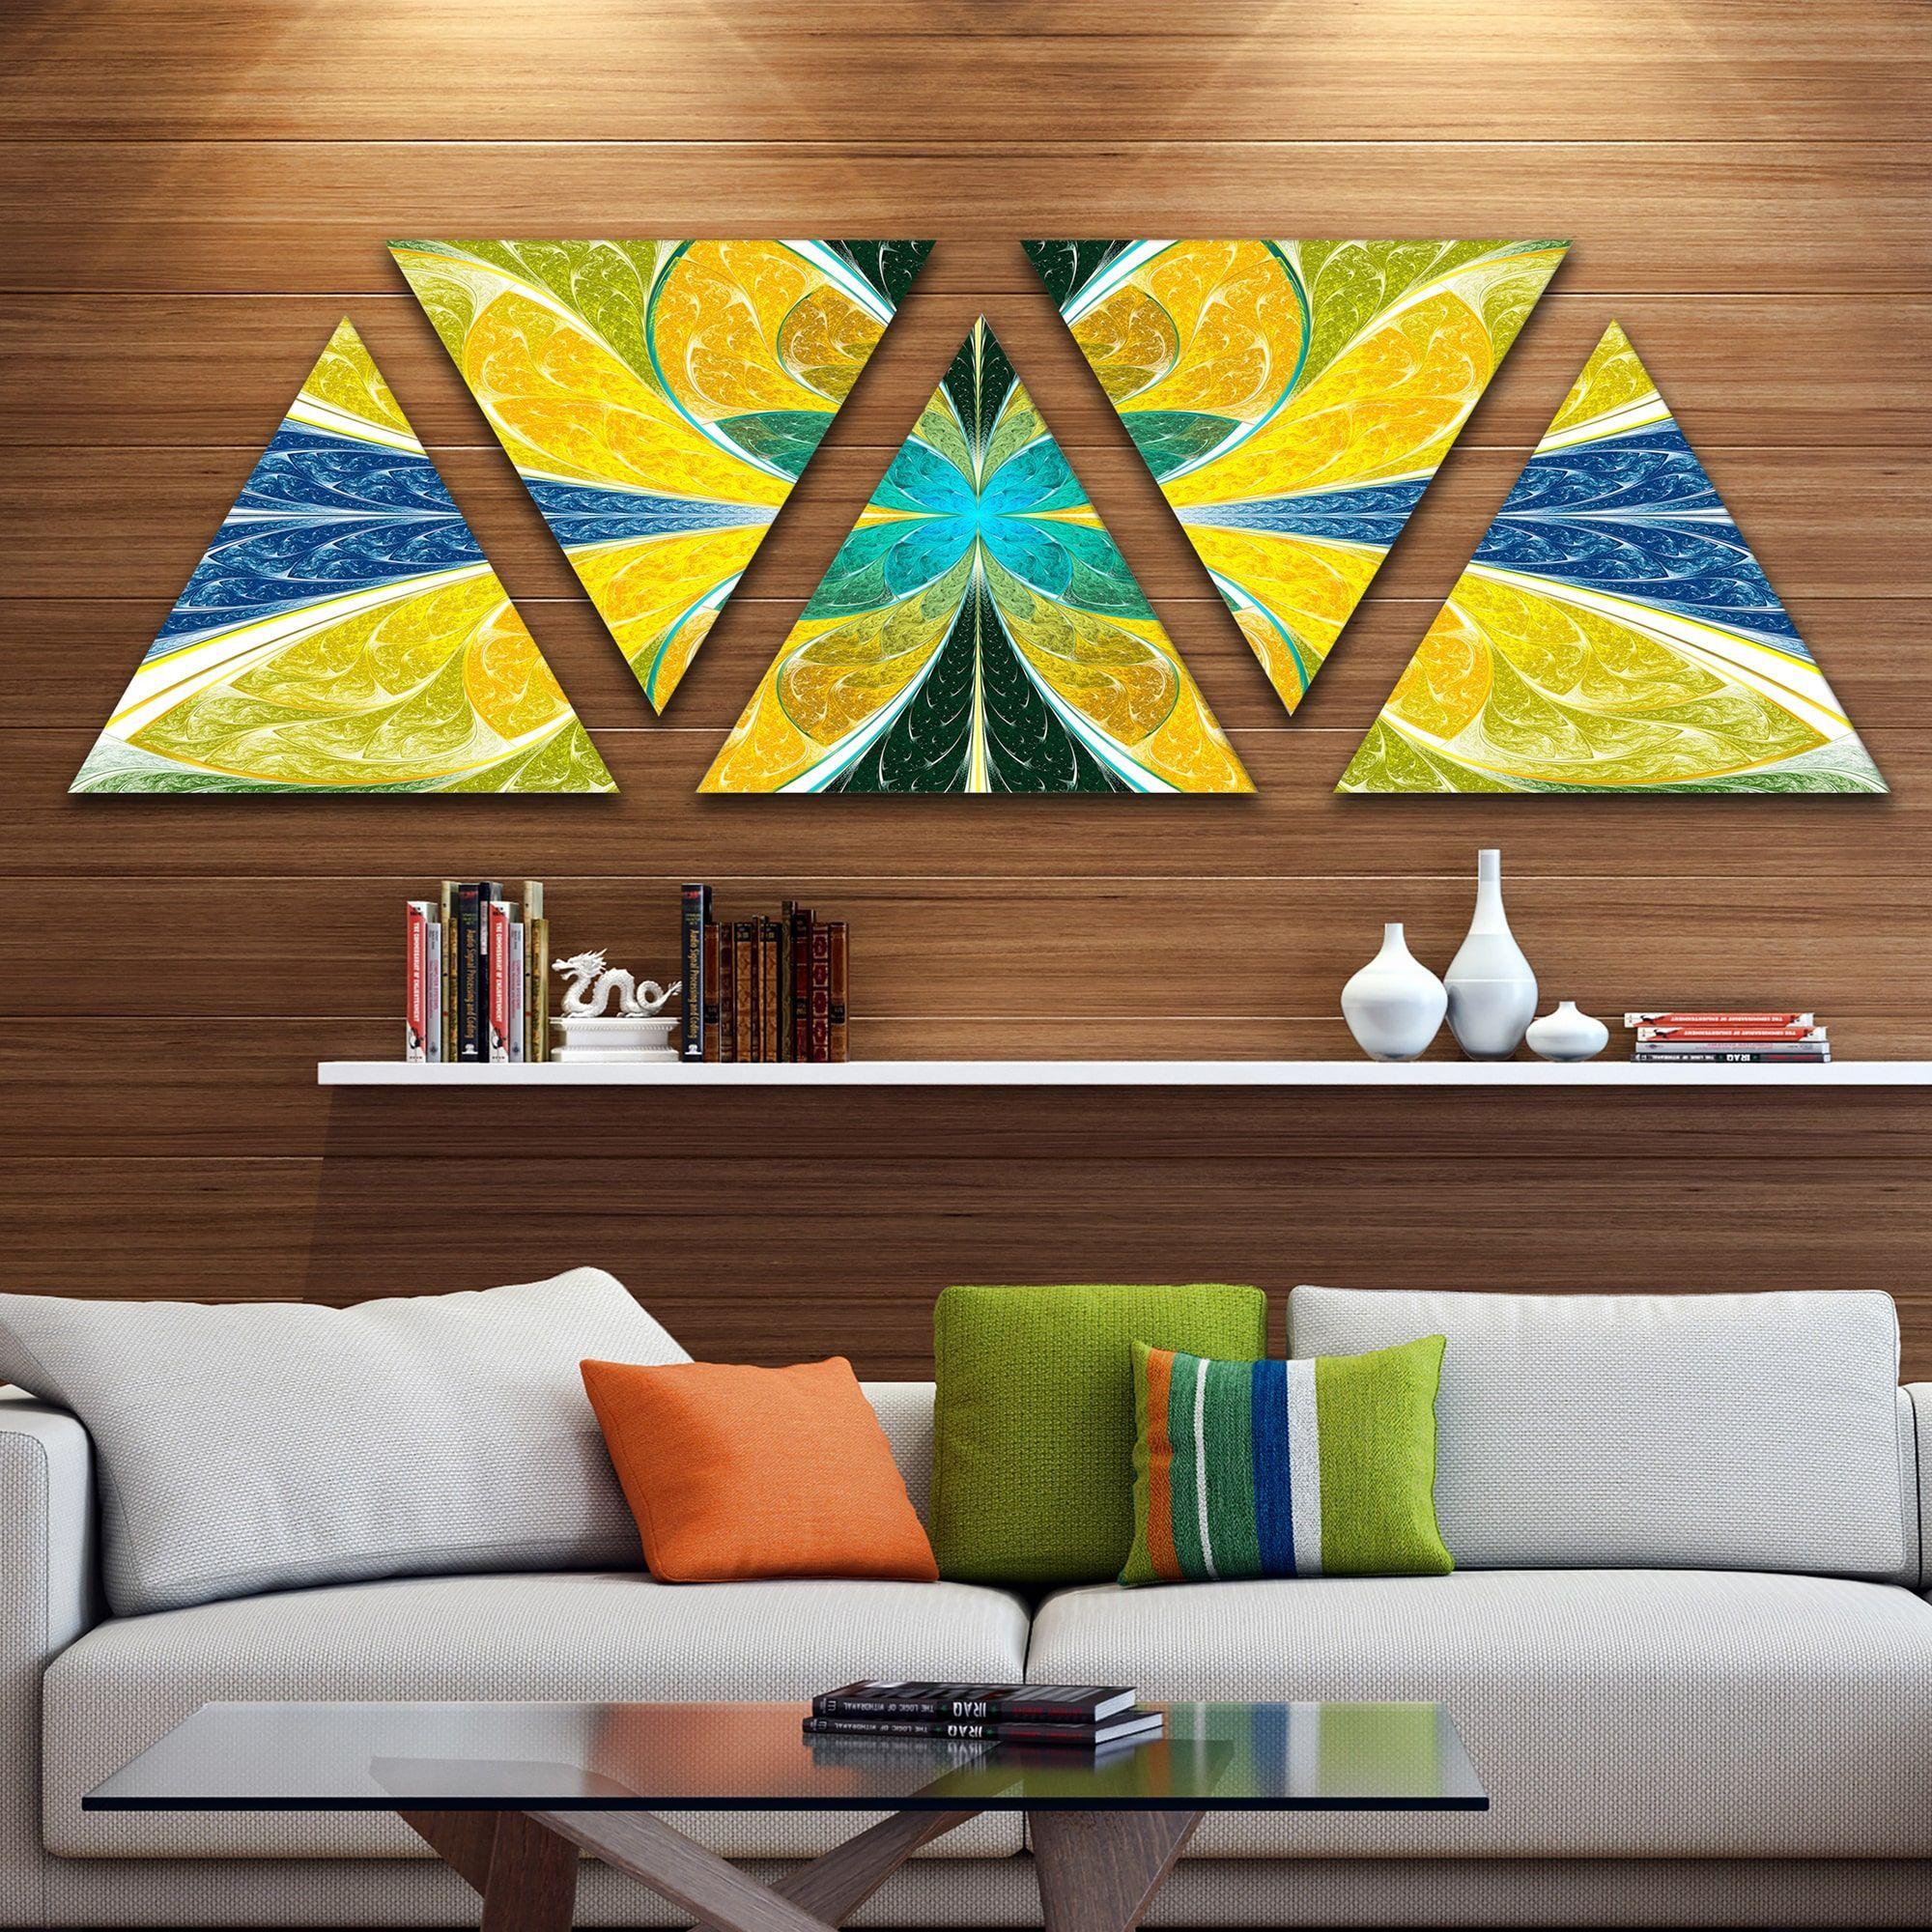 Designart uyellow fractal stained glassu contemporary wall art